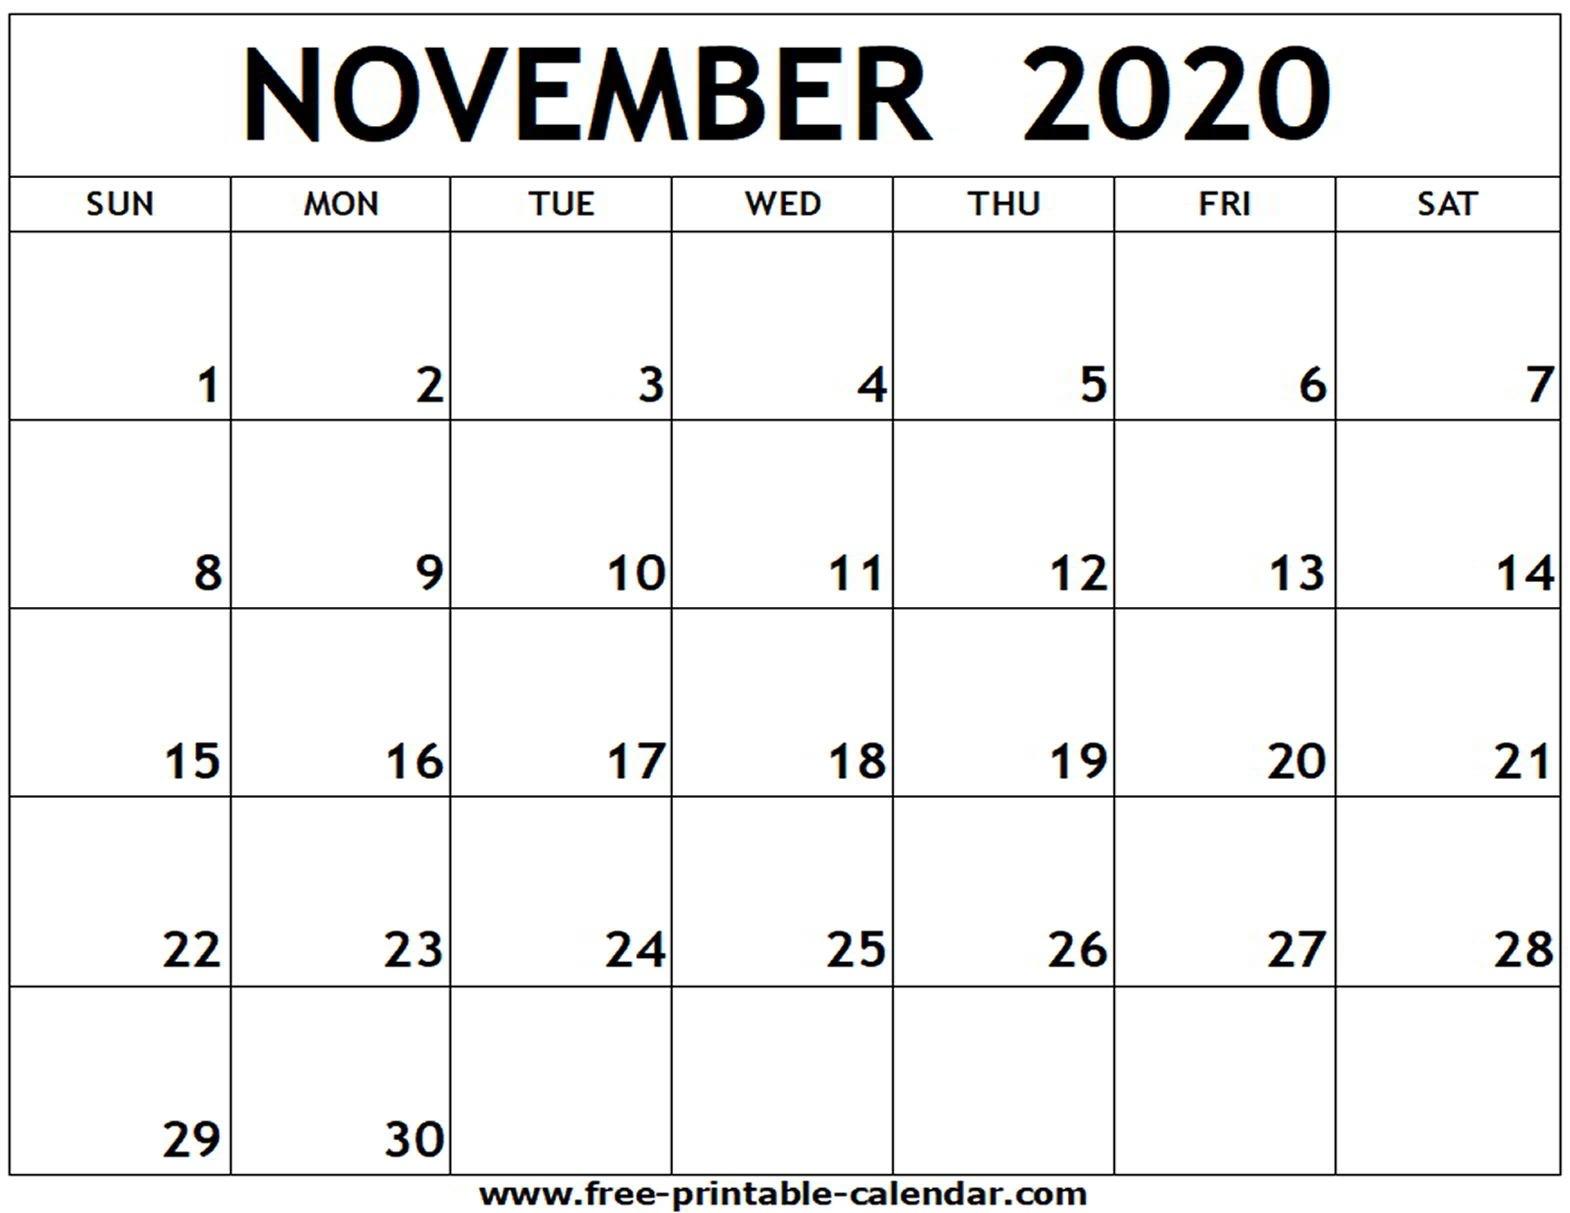 November 2020 Printable Calendar - Free-Printable-Calendar  2020 Calendar Printable